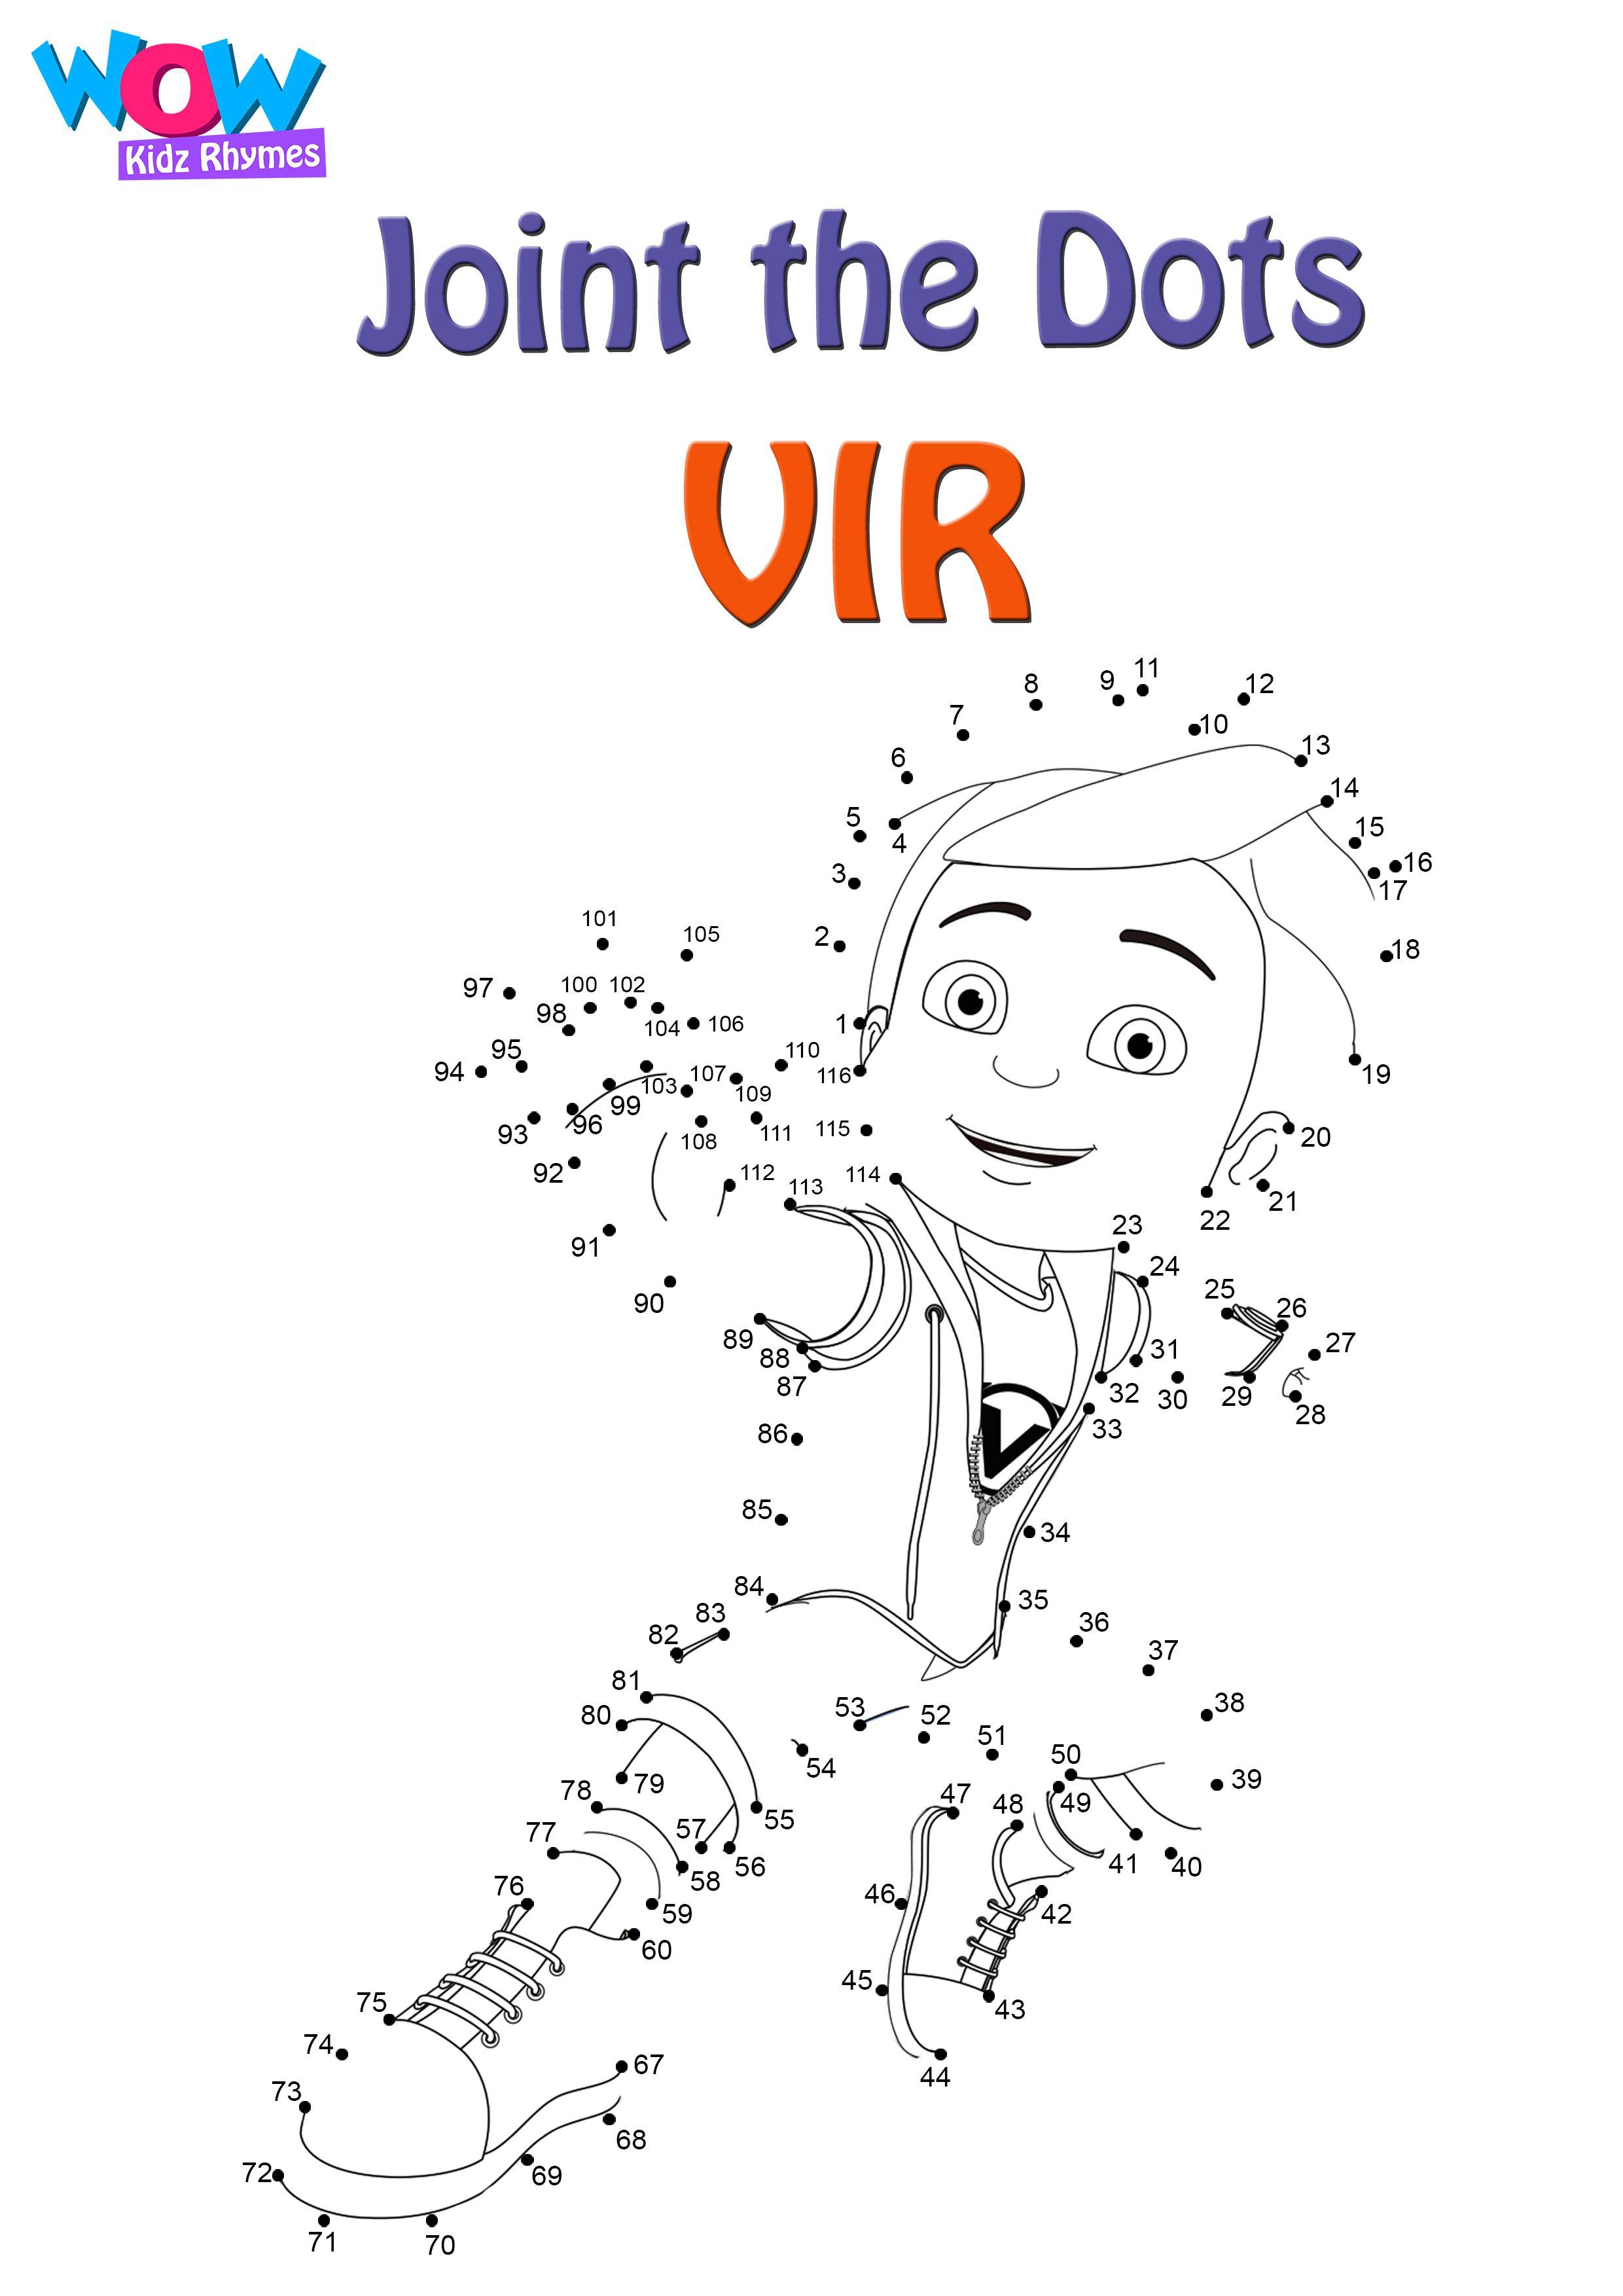 Pin By Wowkidz Rhymes On Kids Nursery Rhymes Kids Nursery Rhymes Rhymes For Kids Favorite Cartoon Character [ 3508 x 2480 Pixel ]